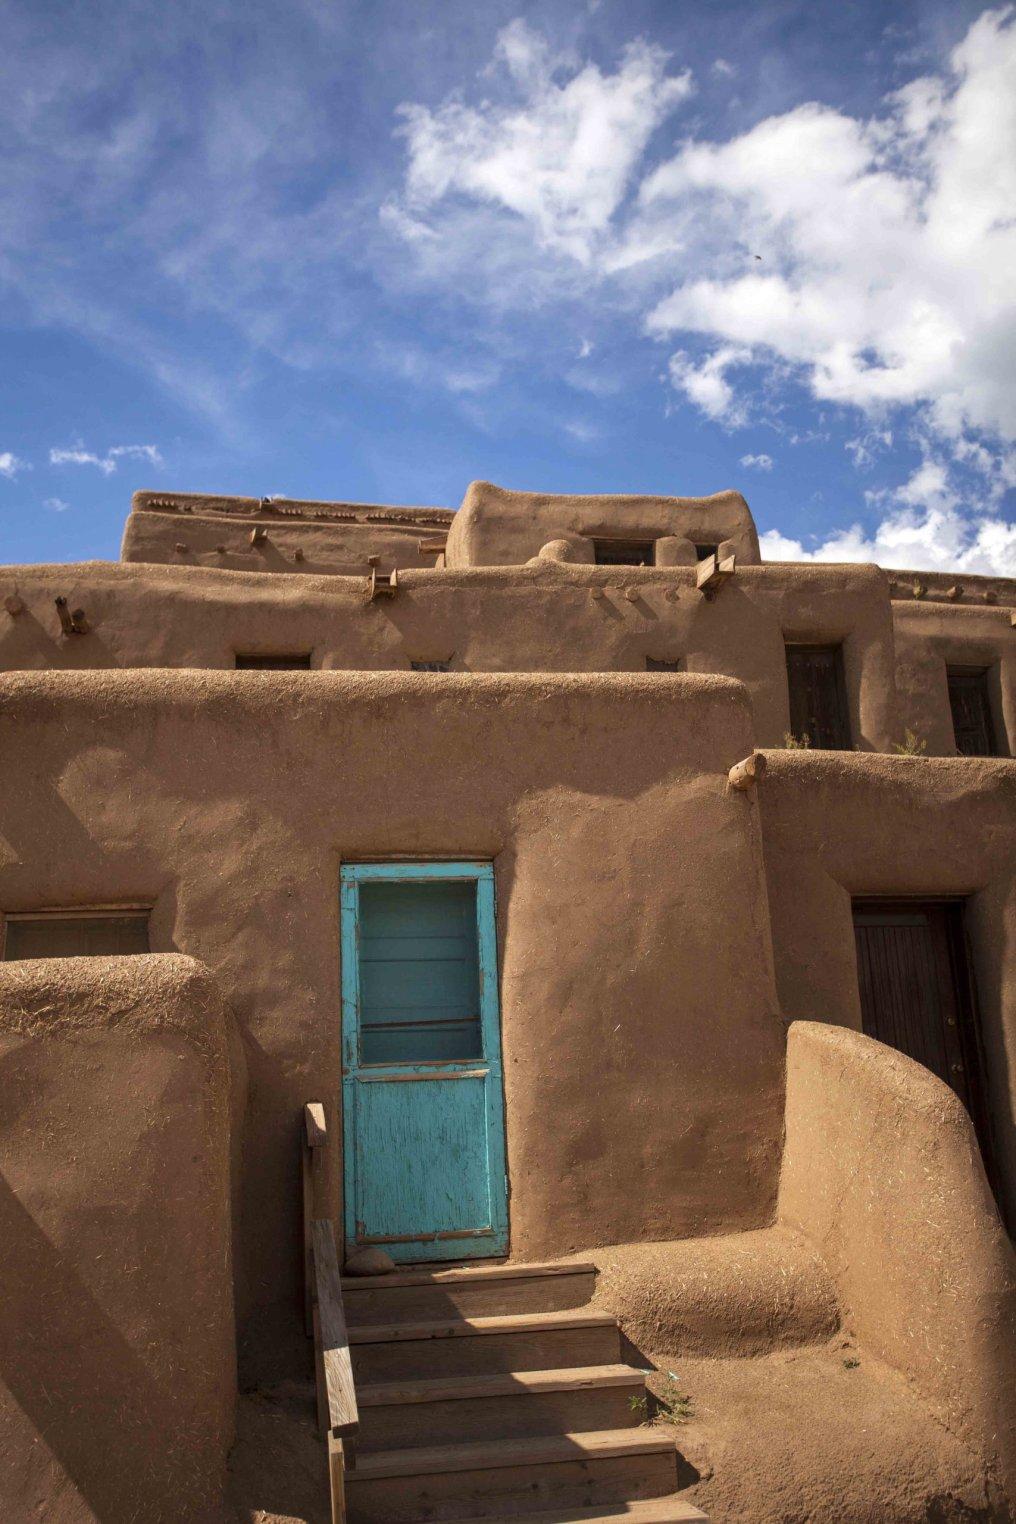 Adobe Architecture Taos Pueblo National Historic Landmark UNESCO World Heritage Site